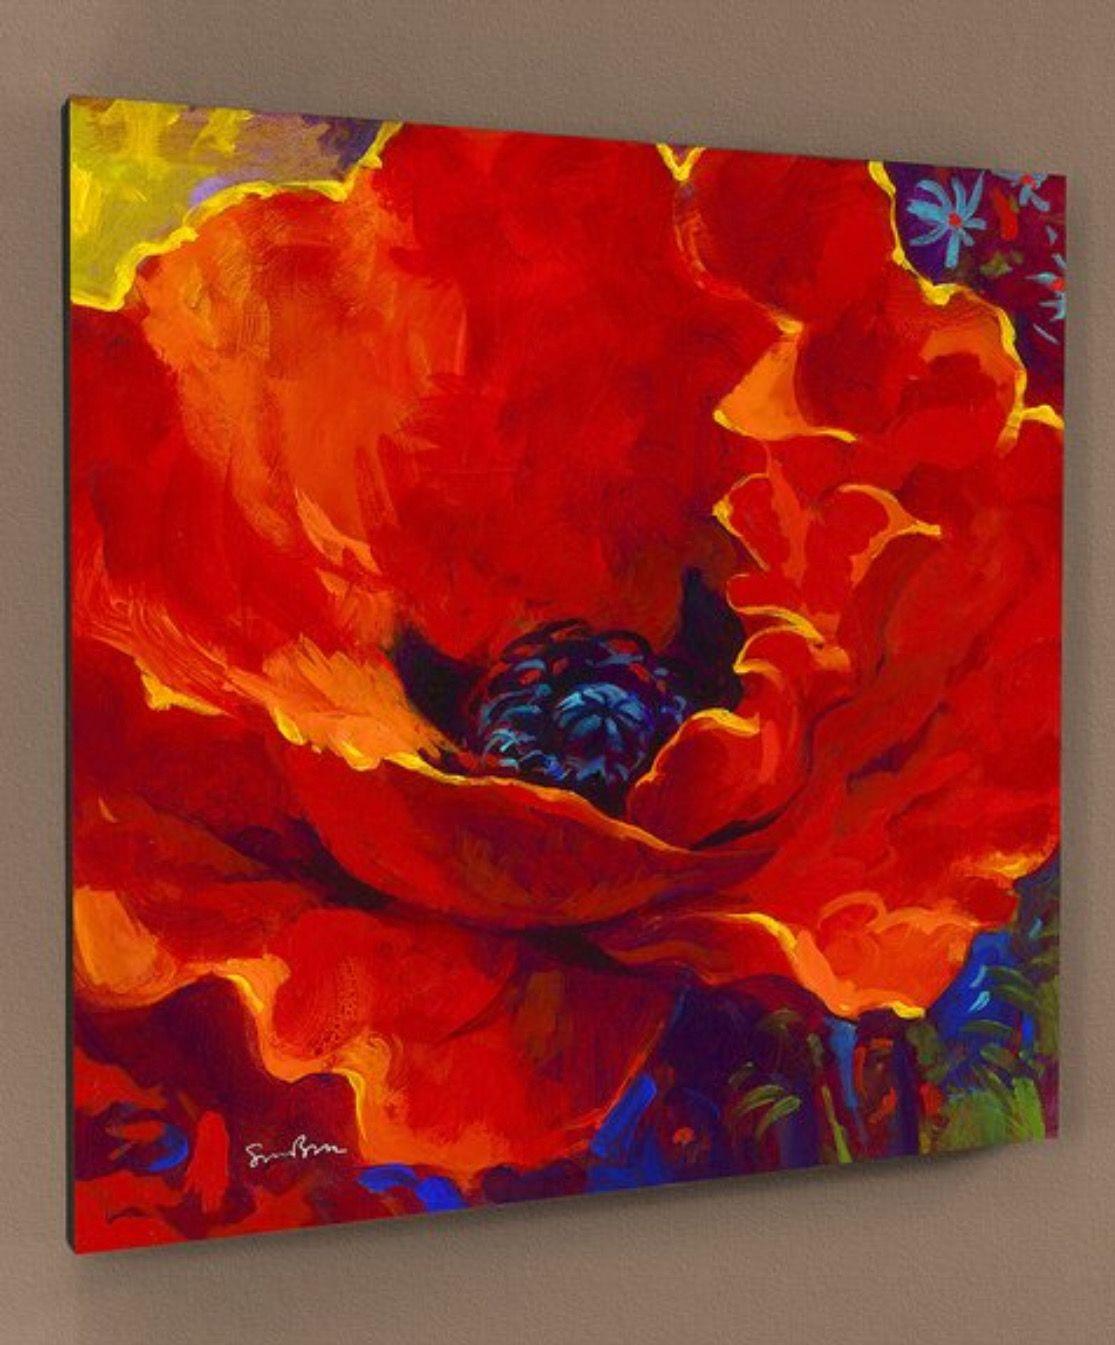 Pin de Florentina Perez en óleo | Pinterest | Flores, Cuadro y ...